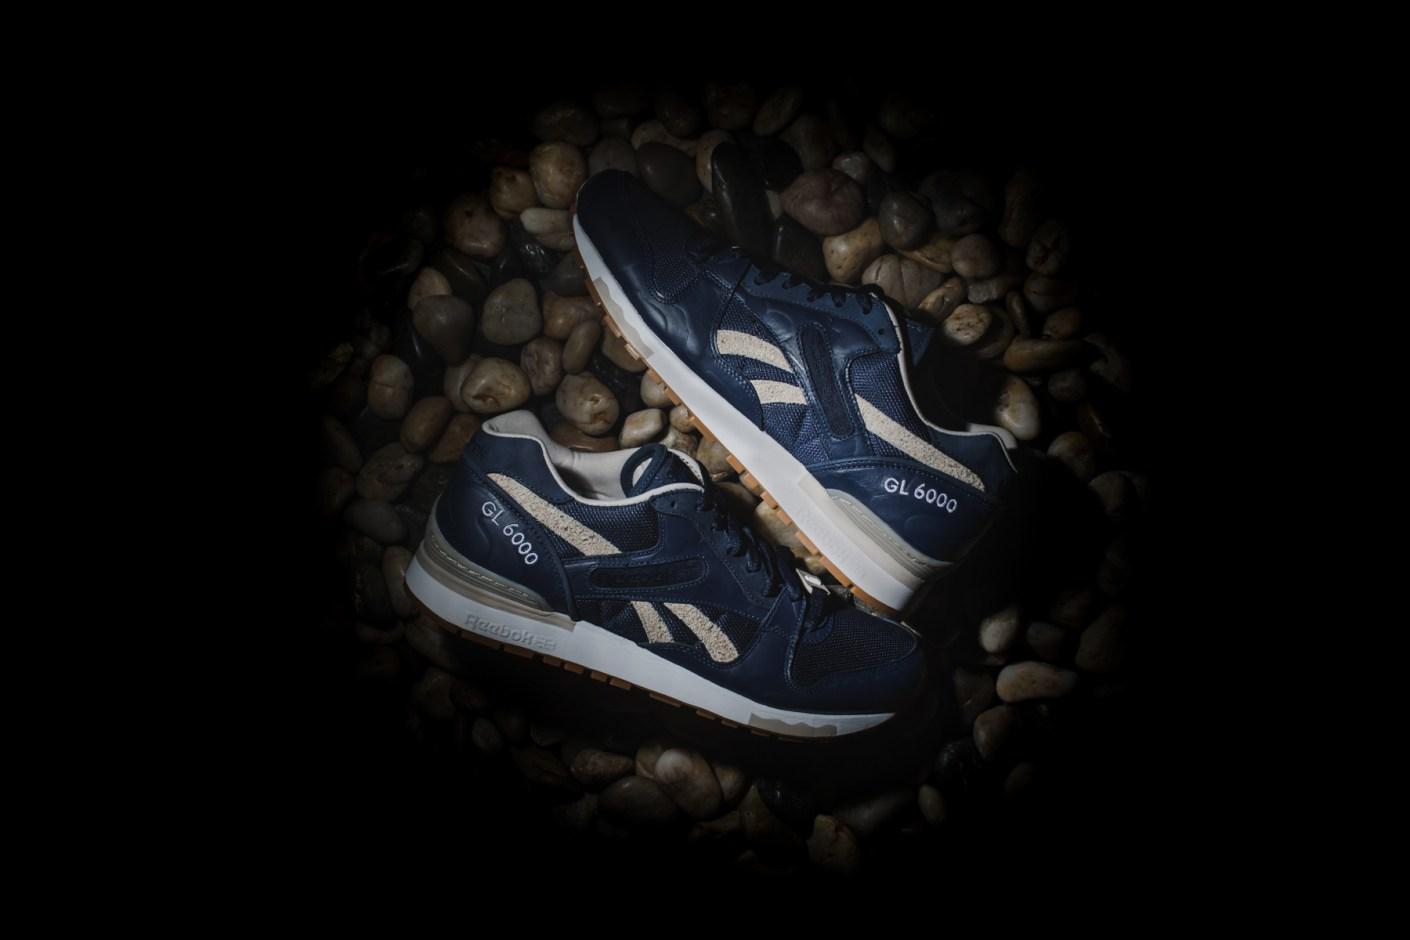 Reebok Navy/Pebble/White M40987 GL 6000 Shoe | HYPEBEAST Store